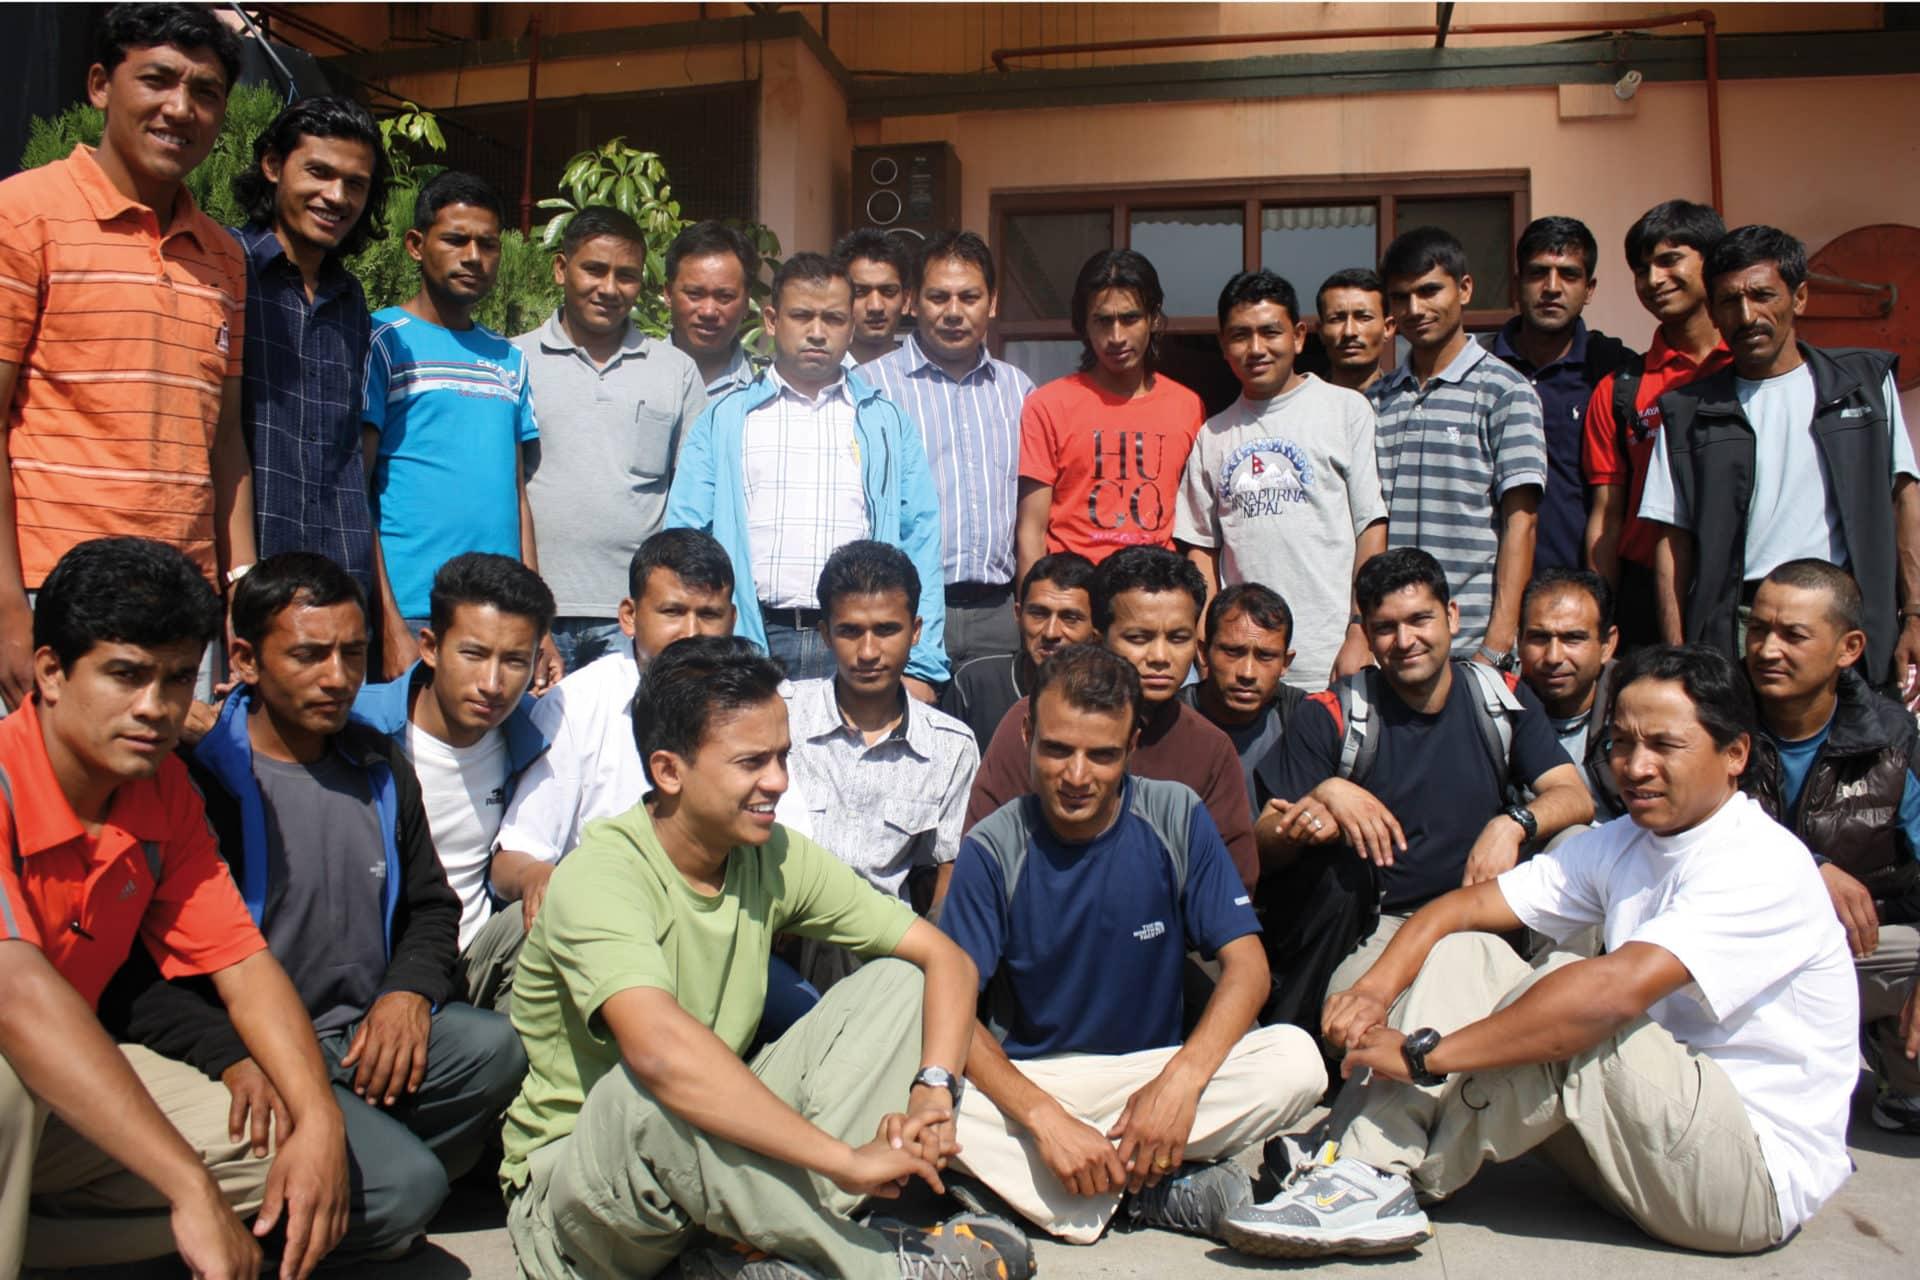 Das HFT-Team vor Ort in Kathmandu, Nepal